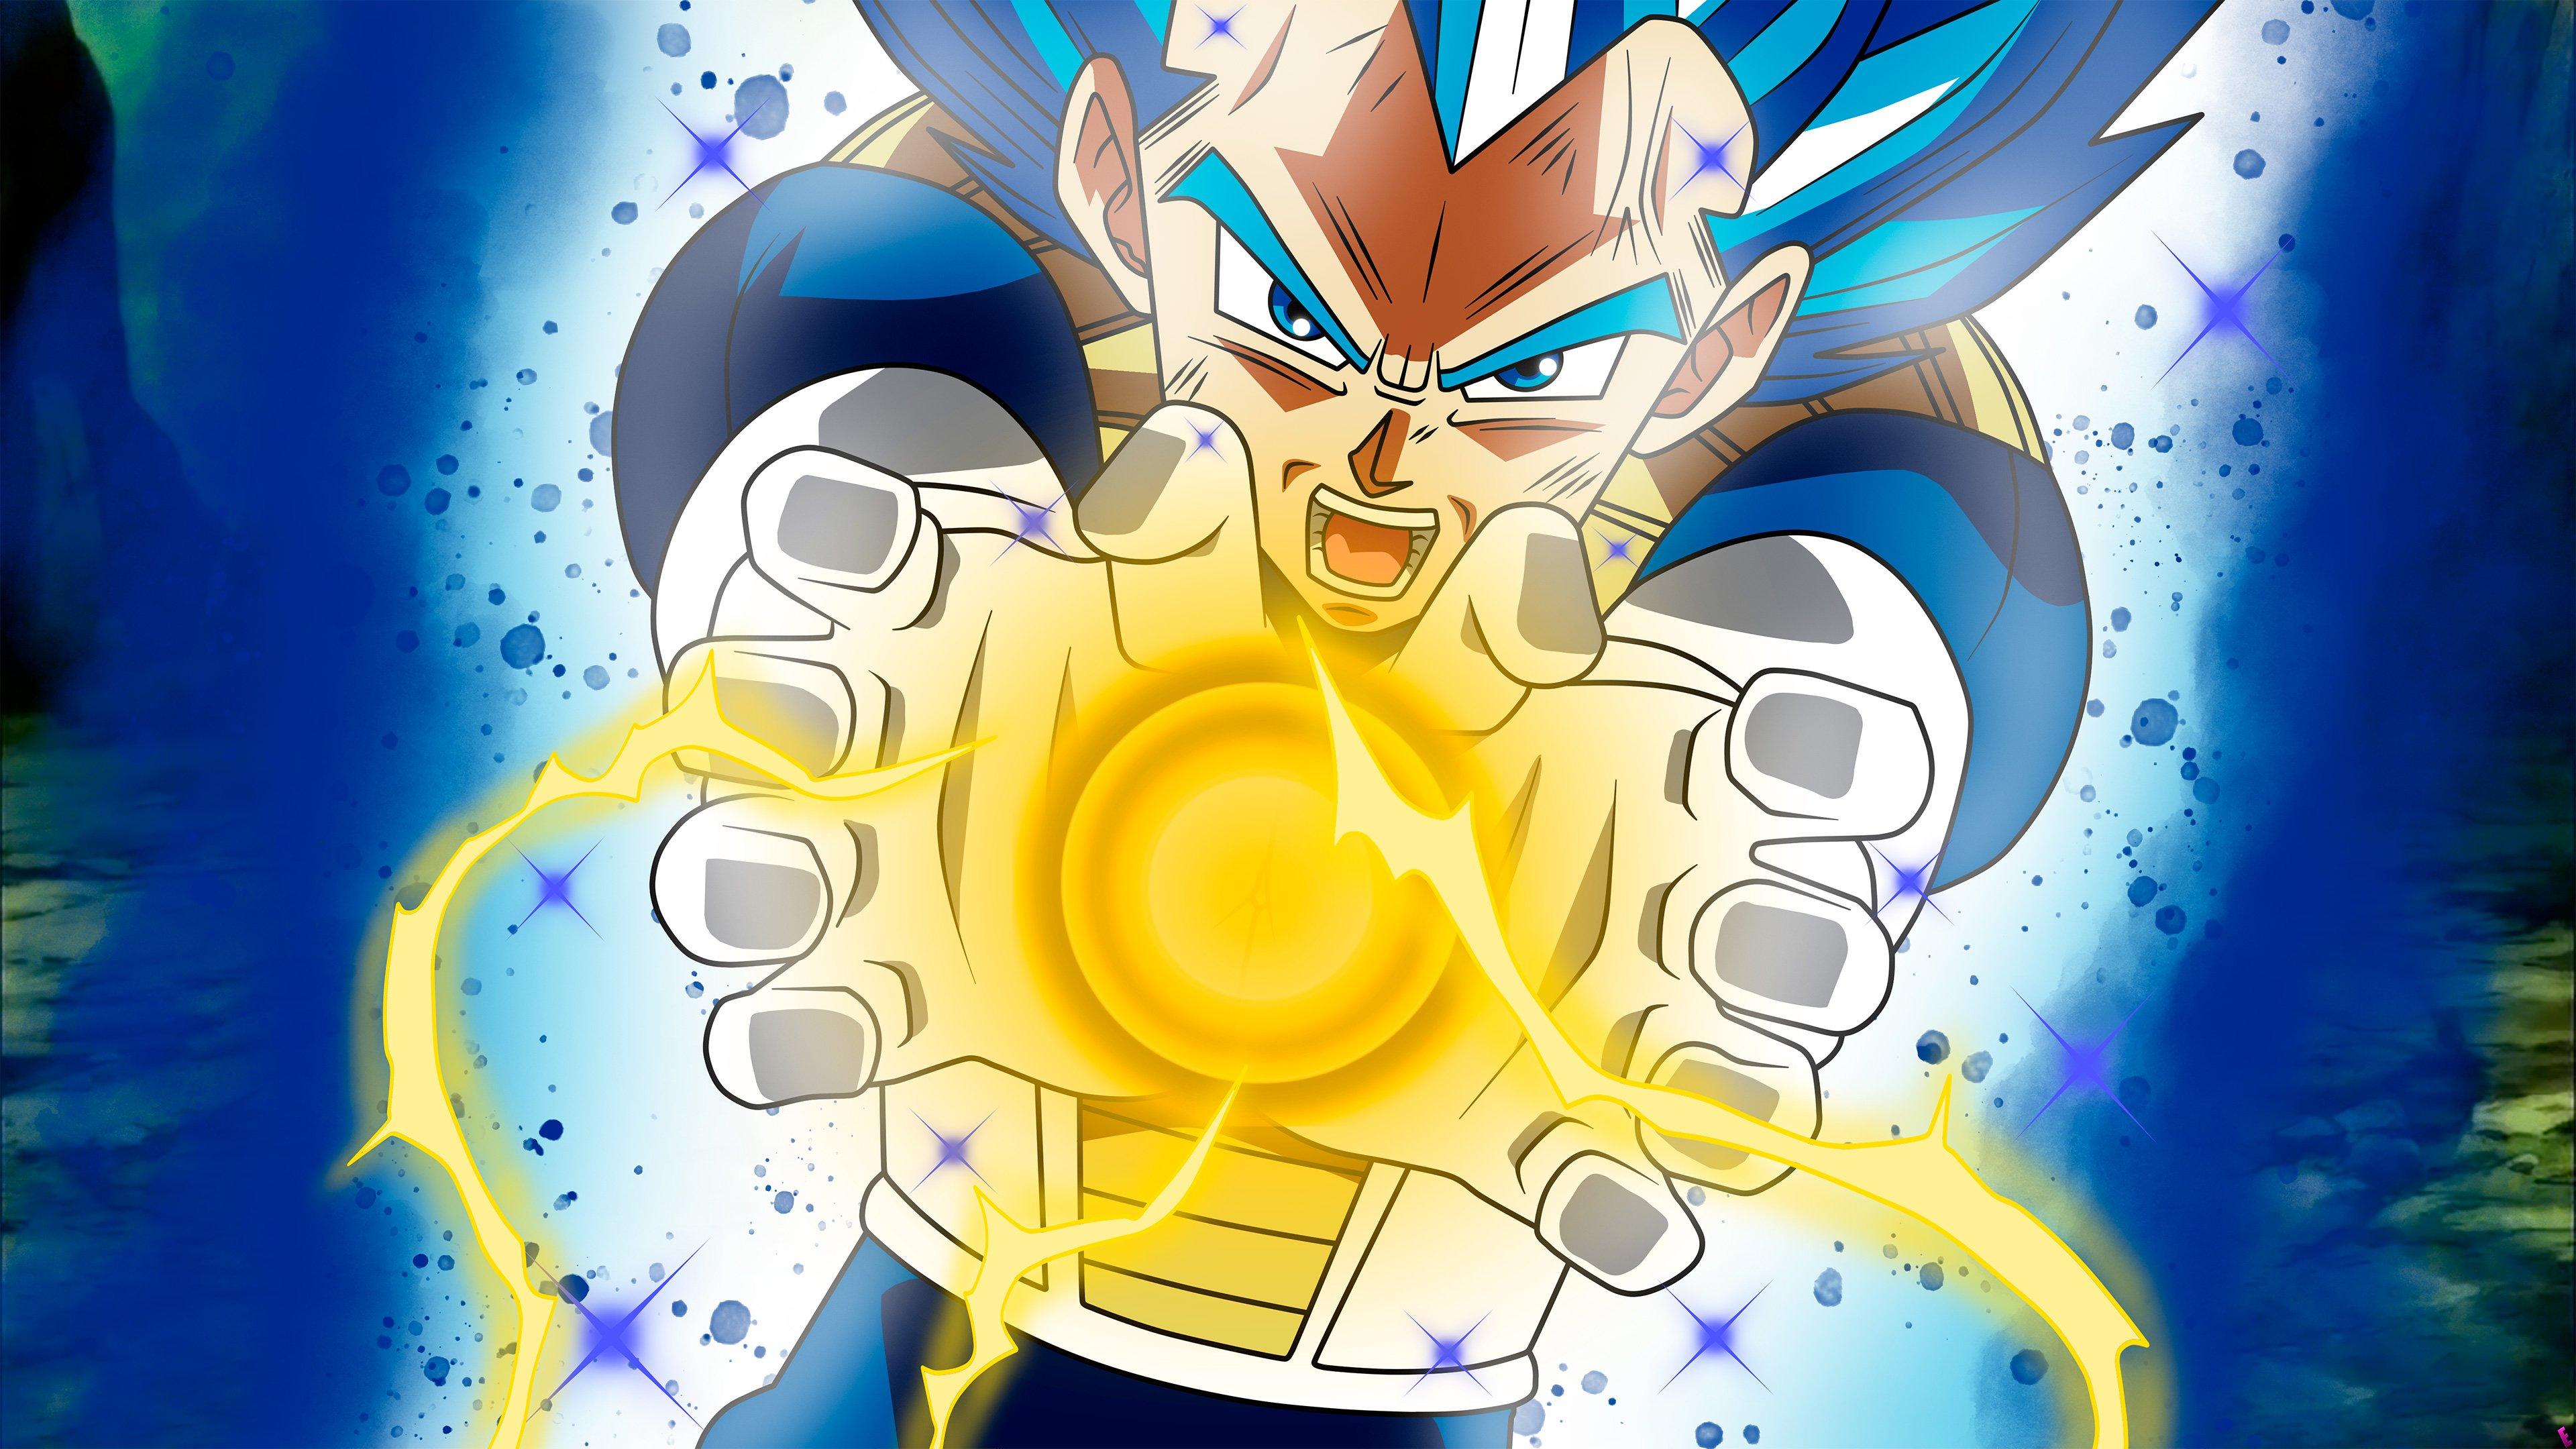 Fondos de pantalla Anime Vegeta Super Saiyan Blue Dragon Ball Super